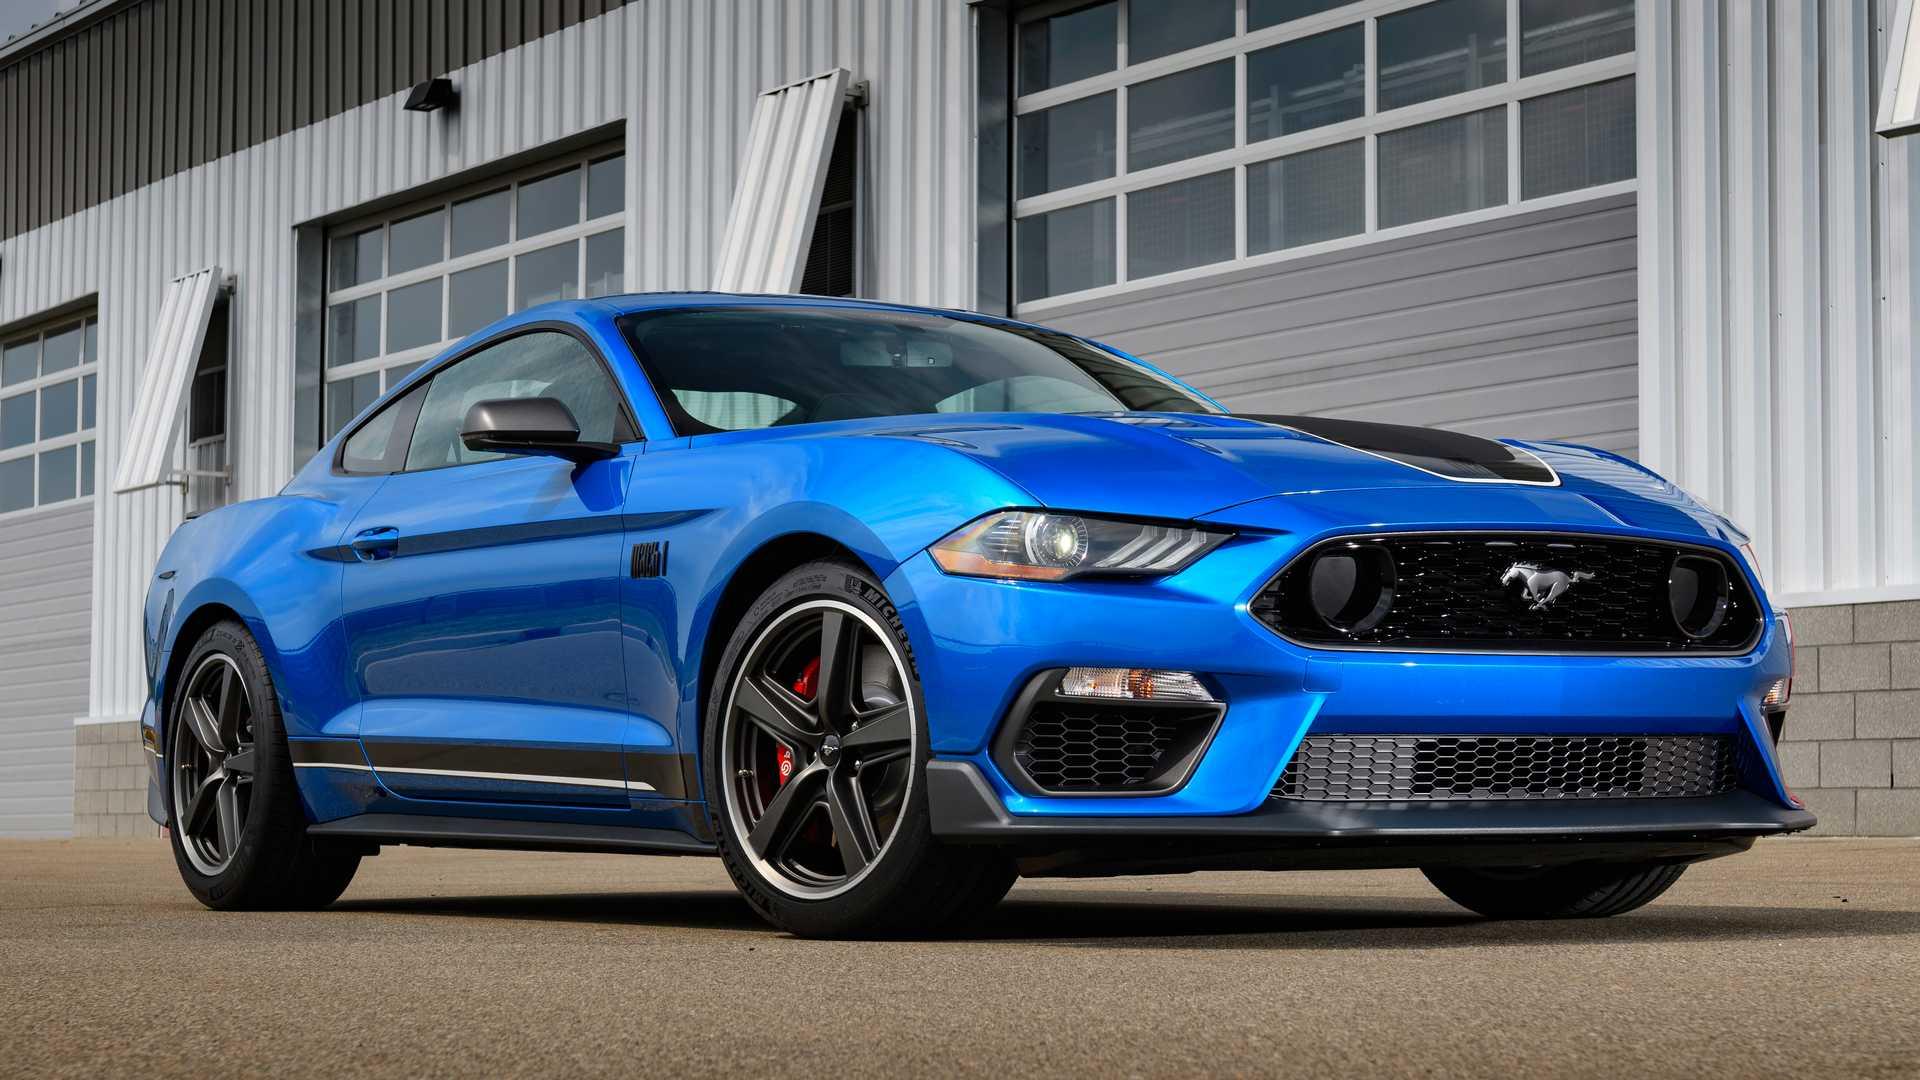 Ford: Πλήρωσε χρυσάφι ένα λάθος στο φυλλάδιο της Mustang! (pics)